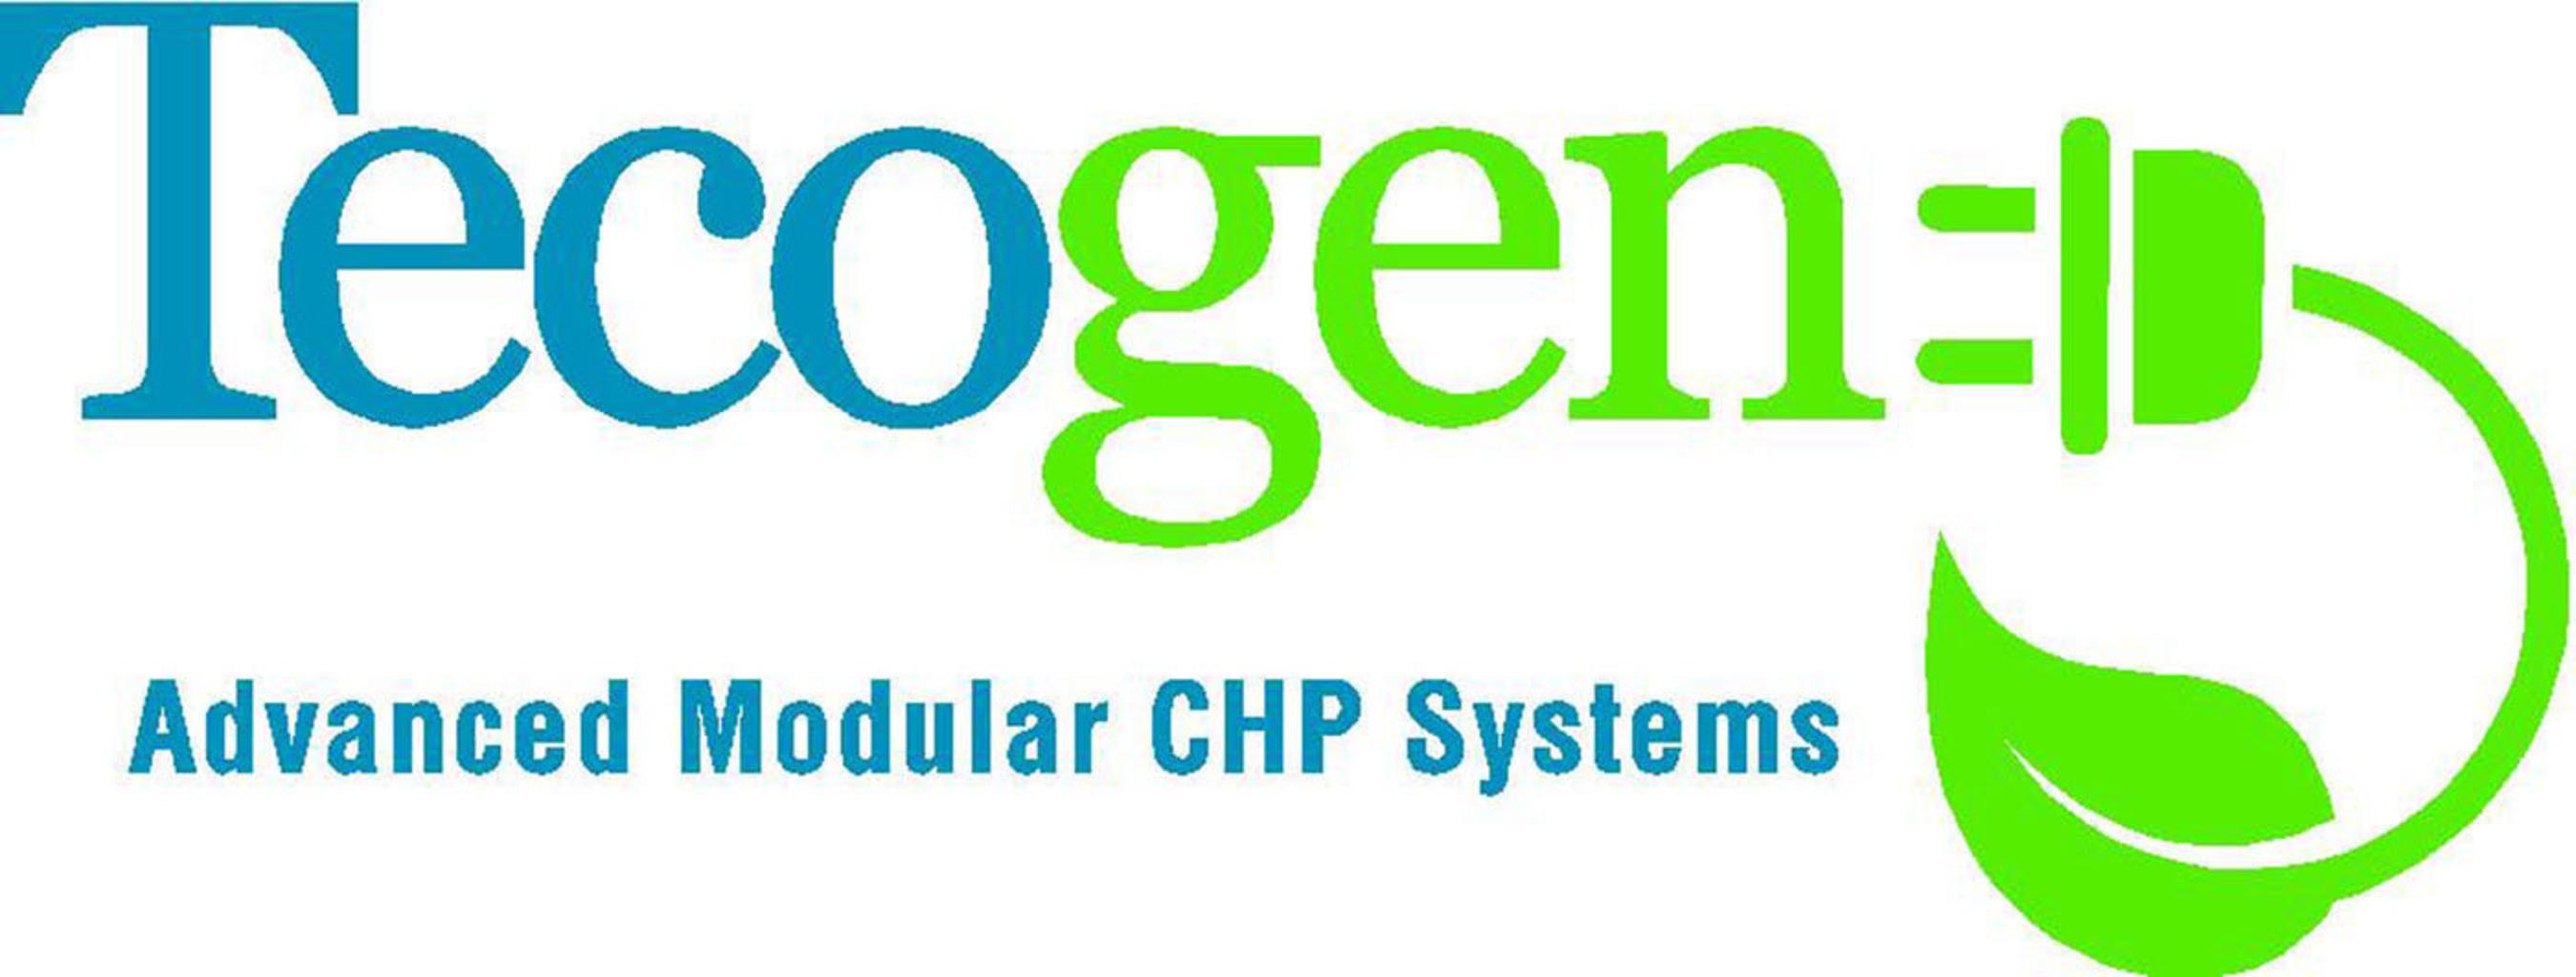 Tecogen Inc. logo.